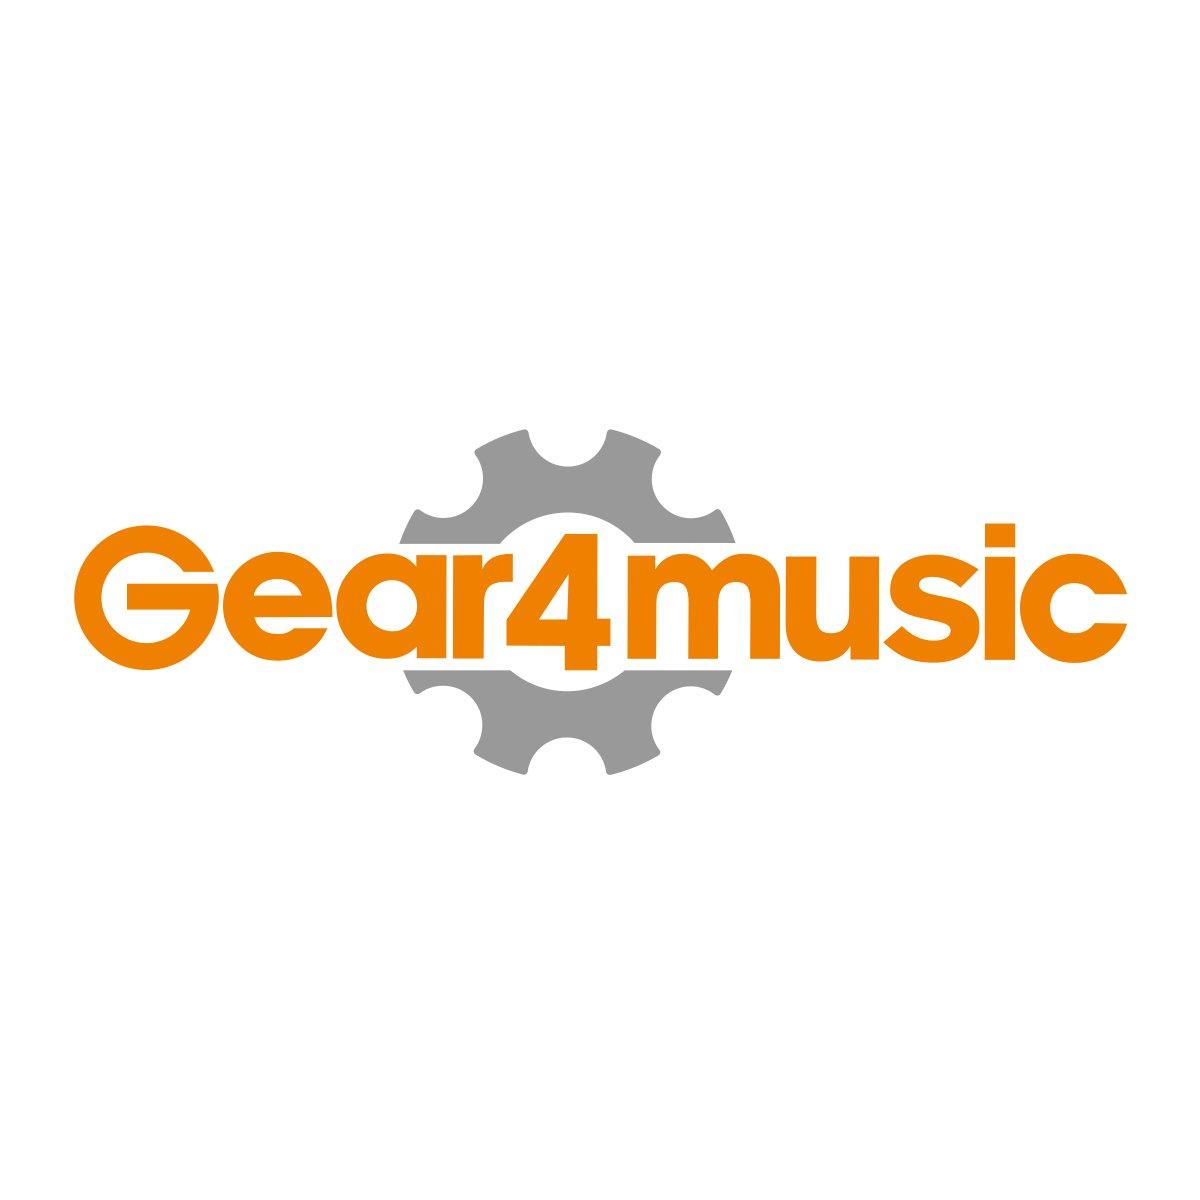 JDP-1 Junior Digital Piano by Gear4music, Matte Black